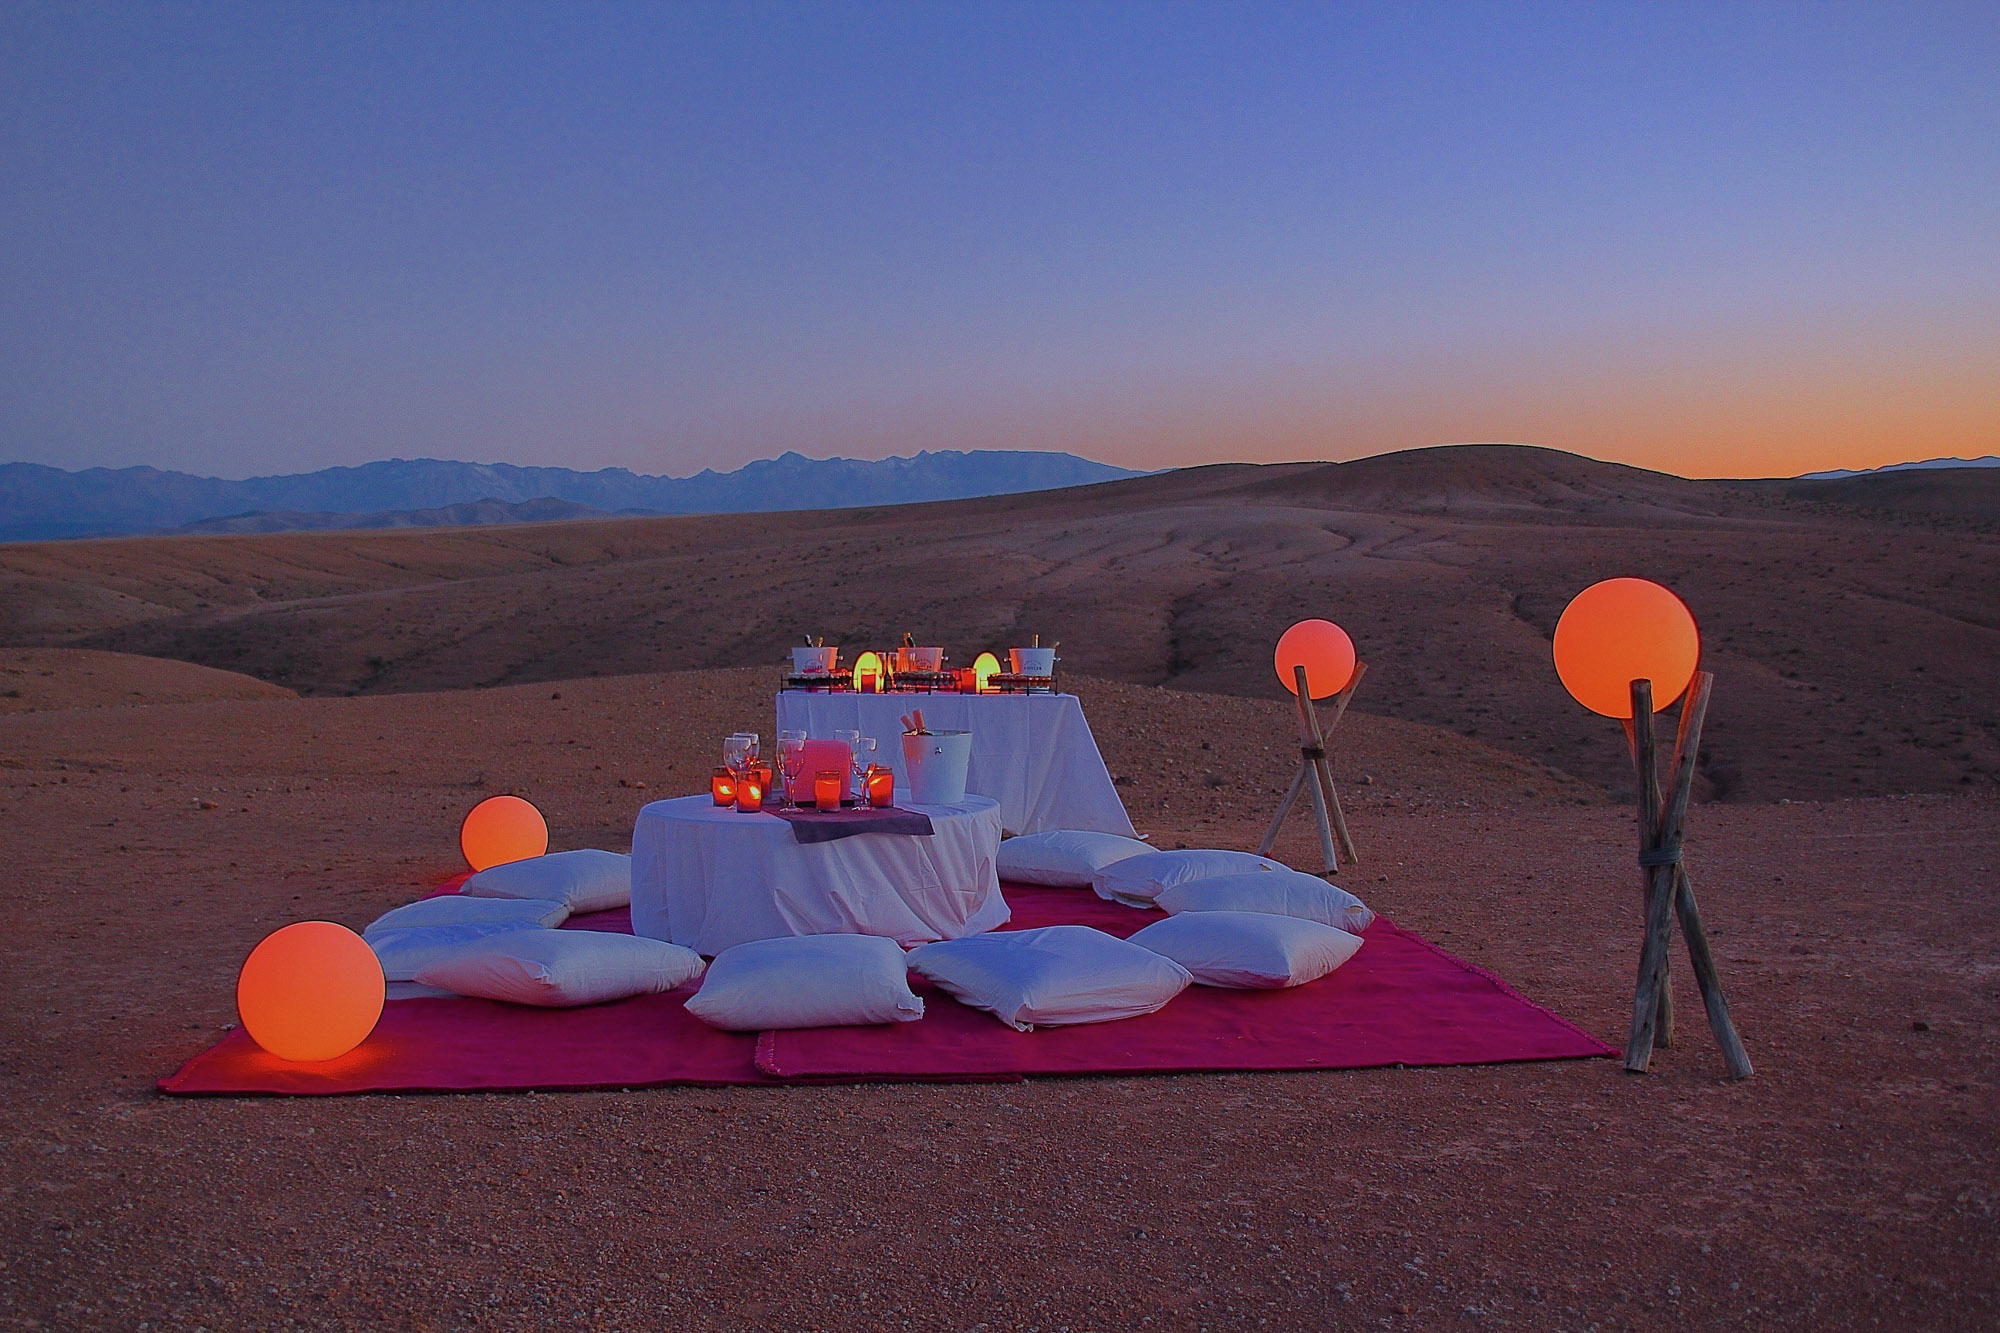 diner désert marrakech agafay maroc